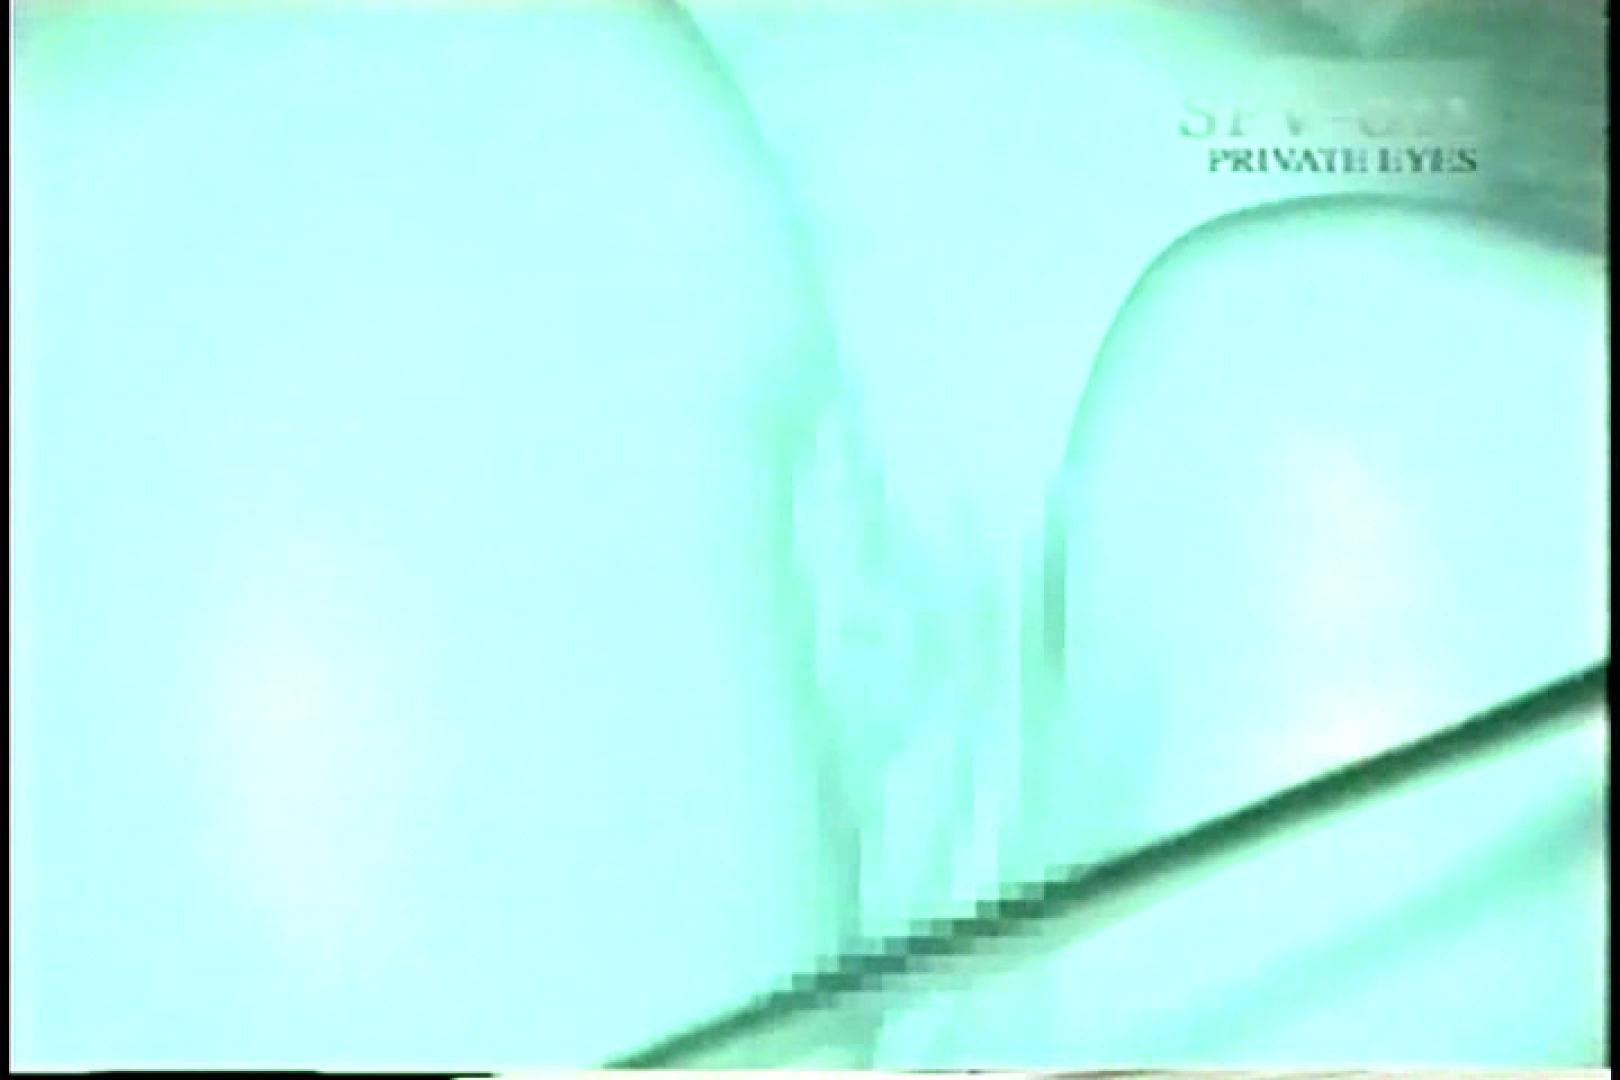 高画質版!SPD-011 盗撮 カーセックス黙示録 (VHS) 高画質 盗撮画像 107PIX 20